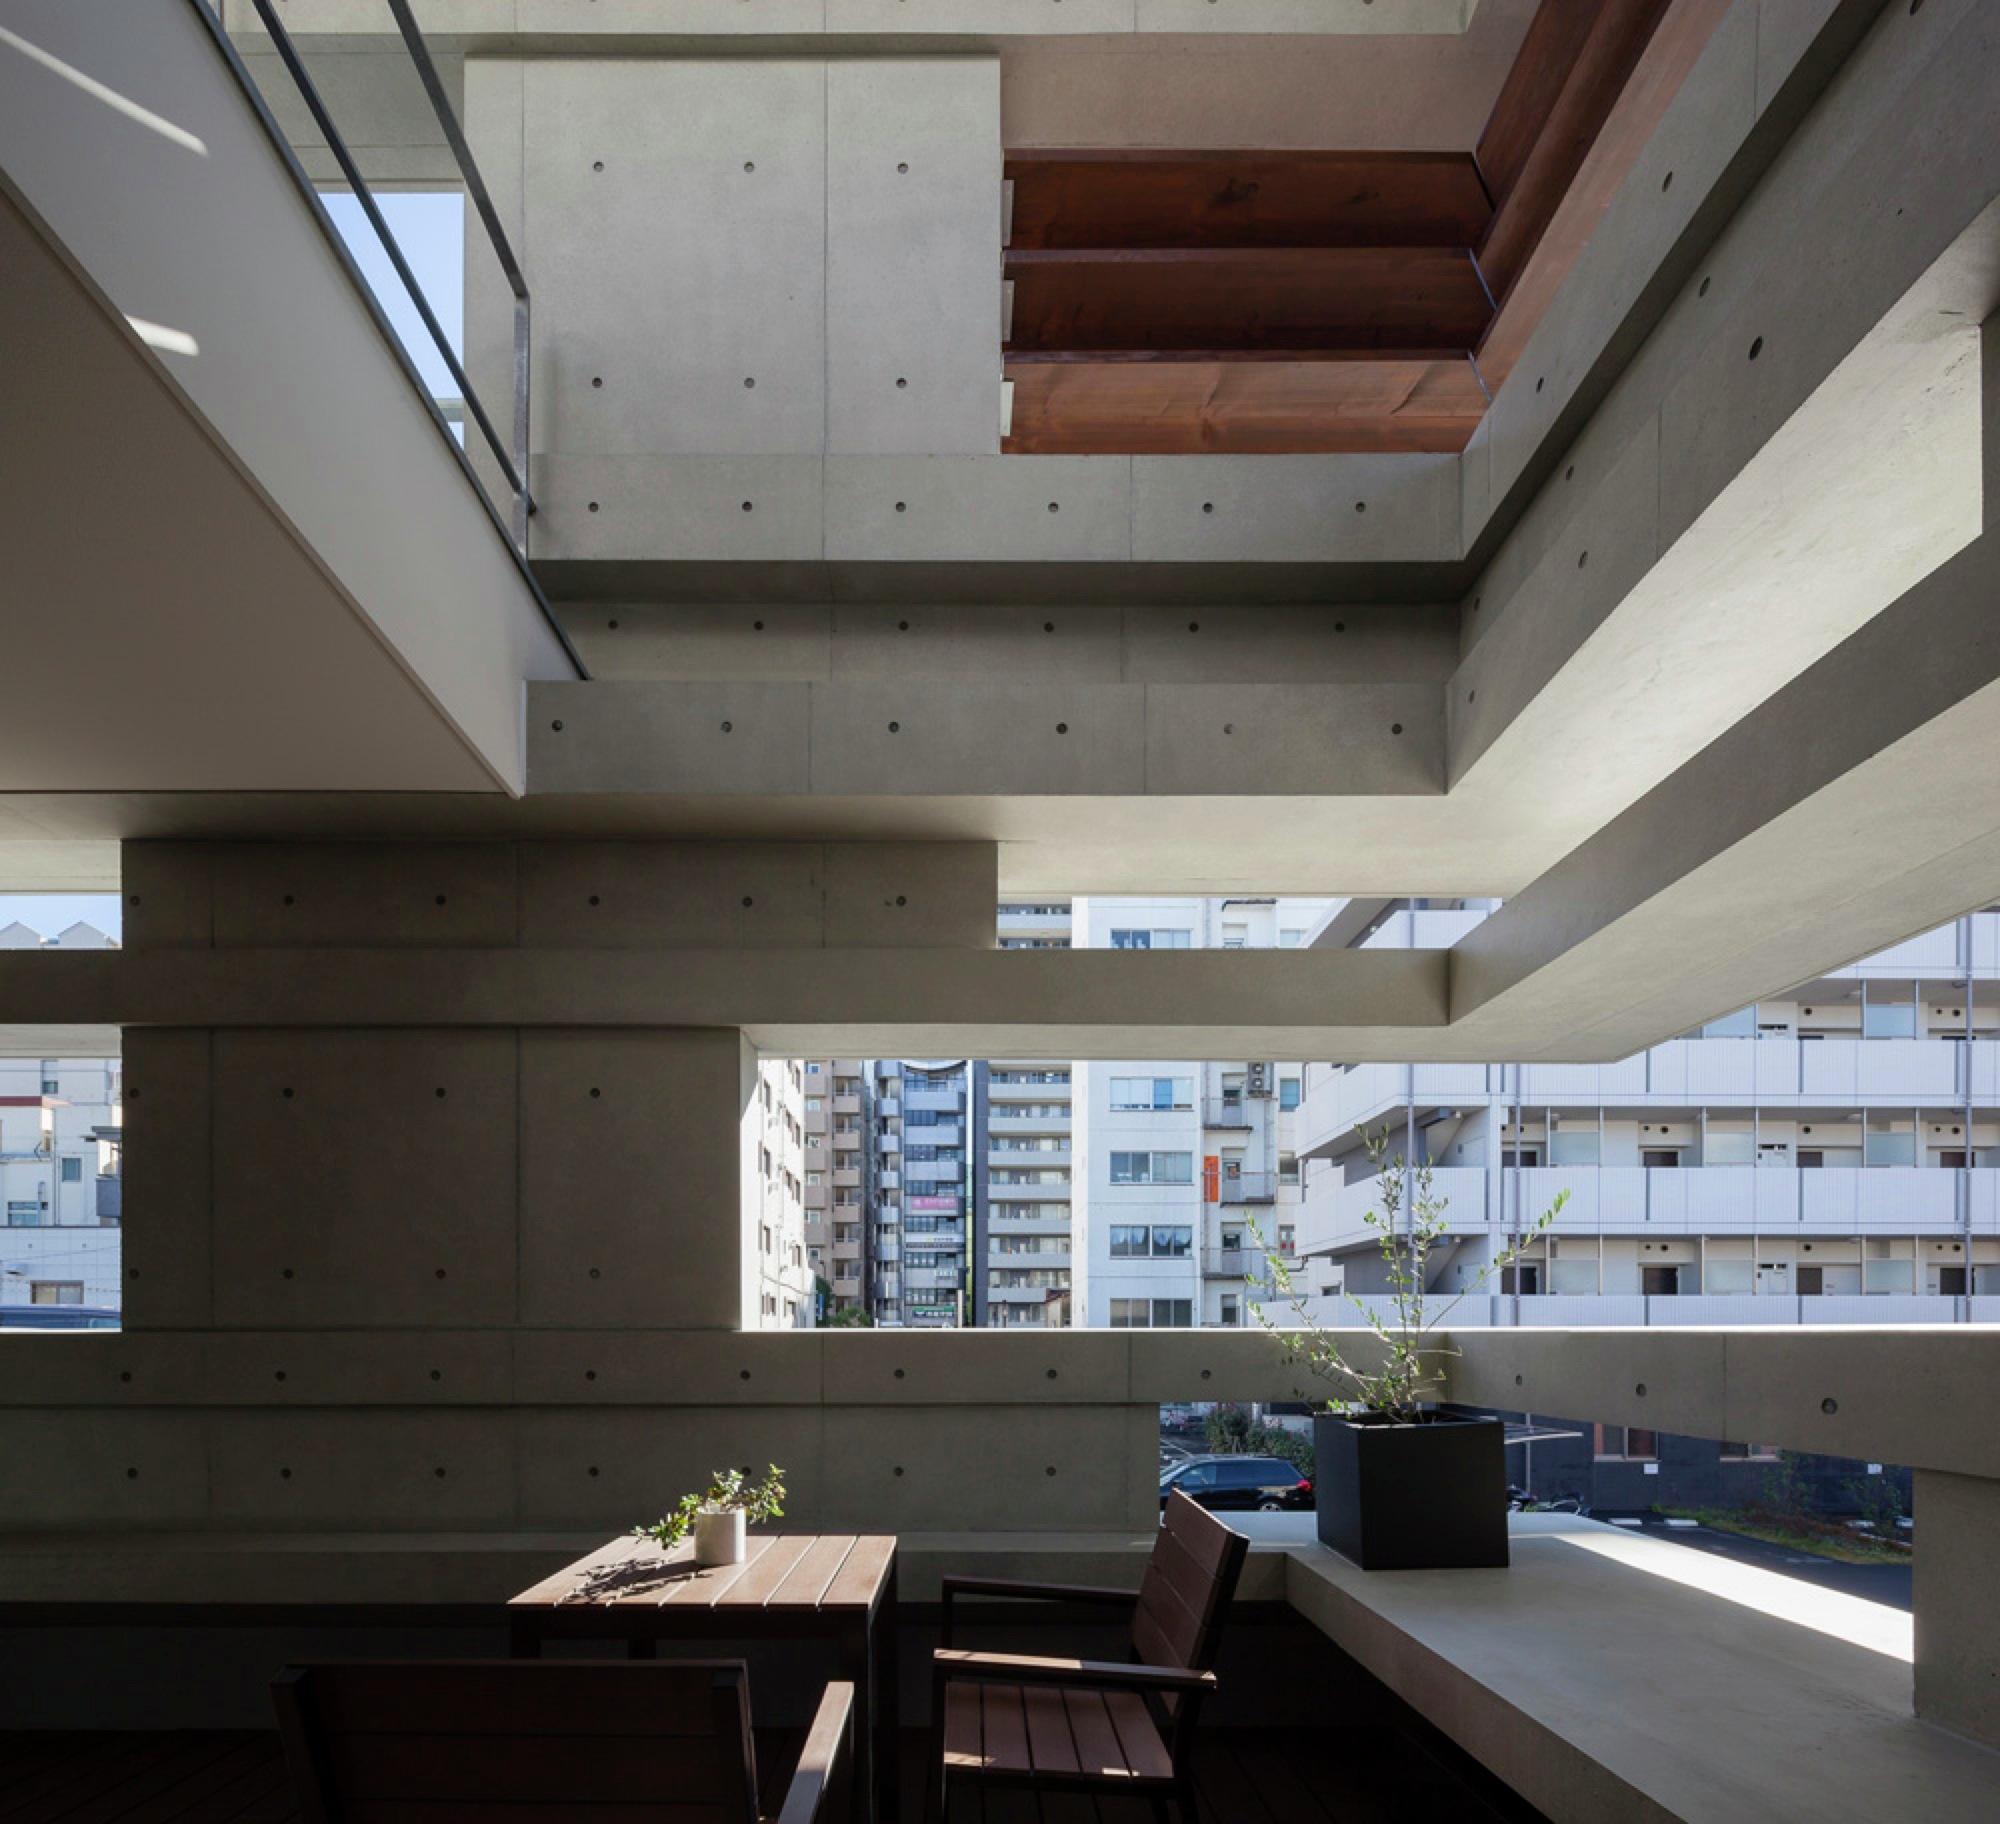 Gallery of cranks hugo kohno architect associates 11 for Architect associates